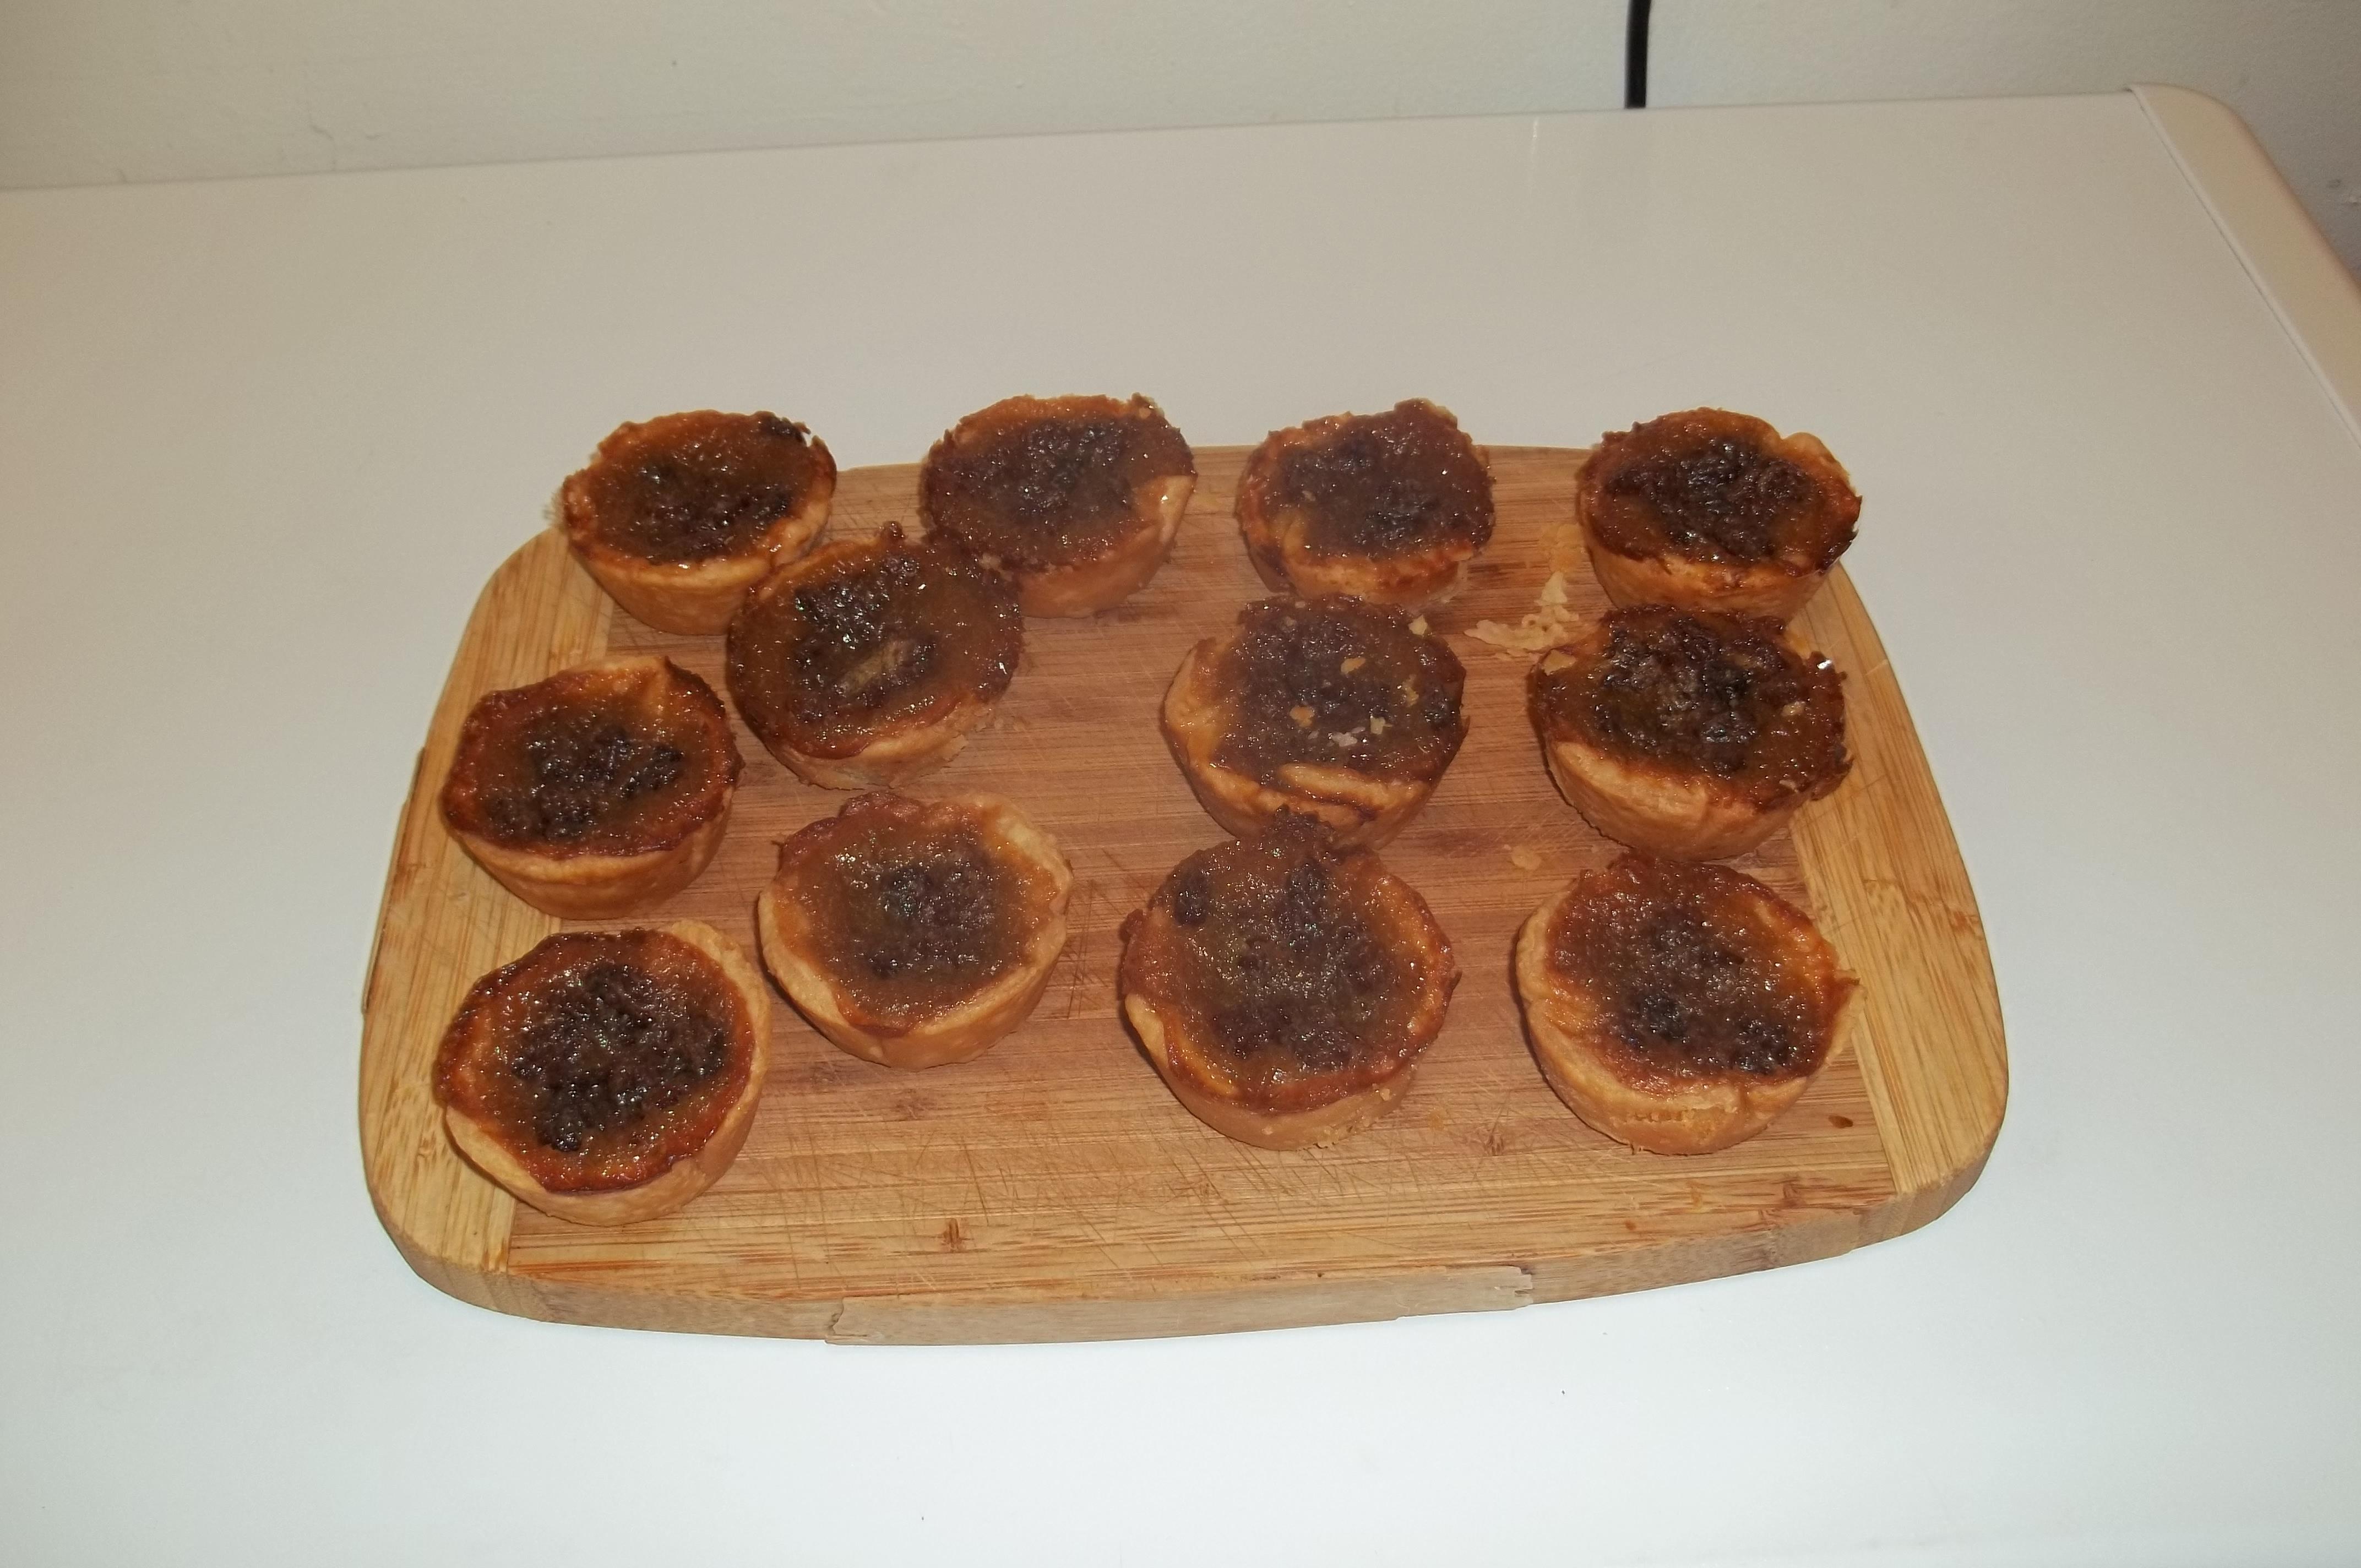 Mrs Welch's Butter Tarts luv2eathav2cook